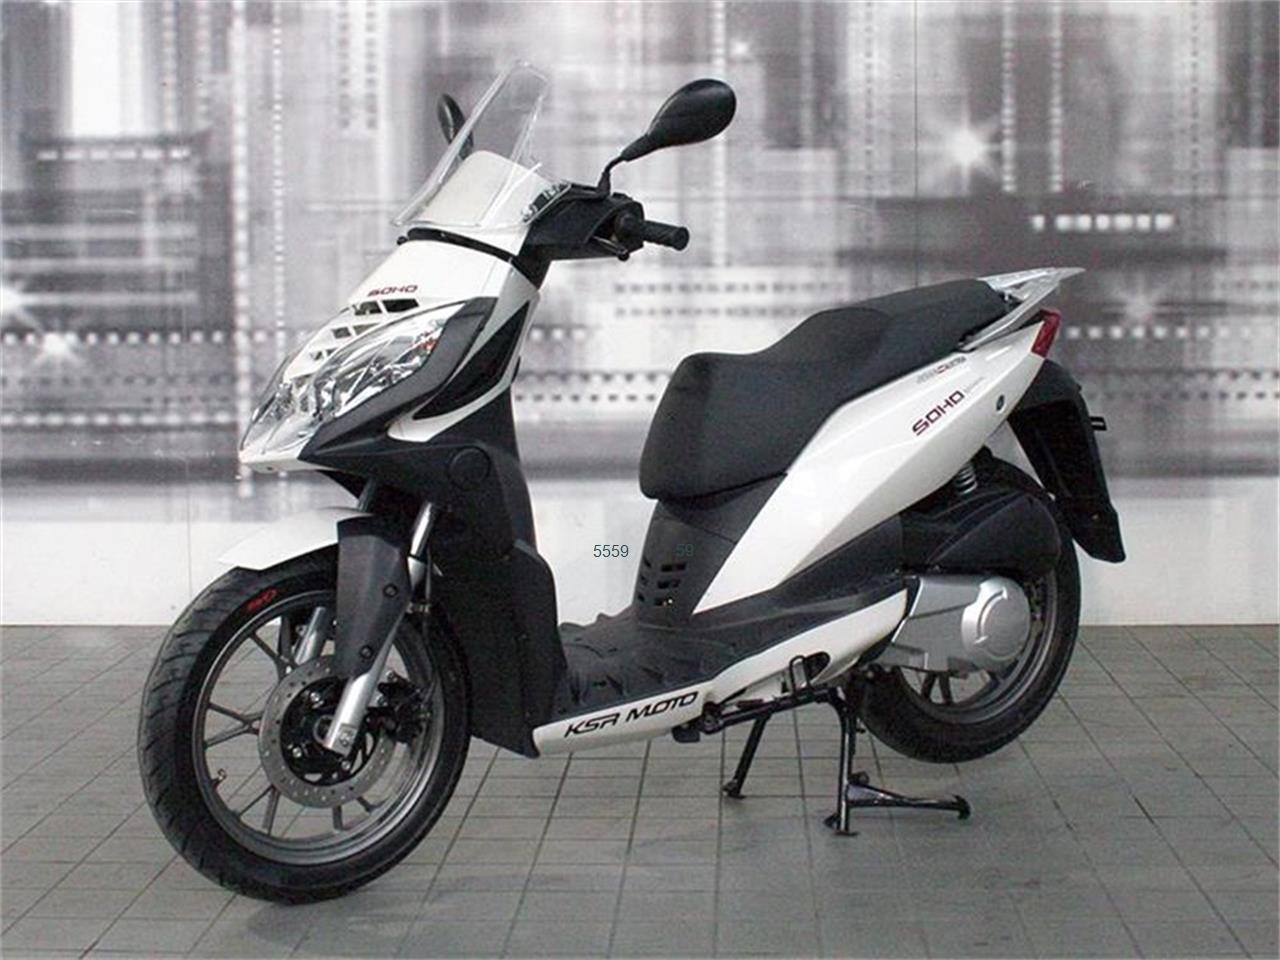 KSR MOTO SOHO 125_4 de venta en Barcelona